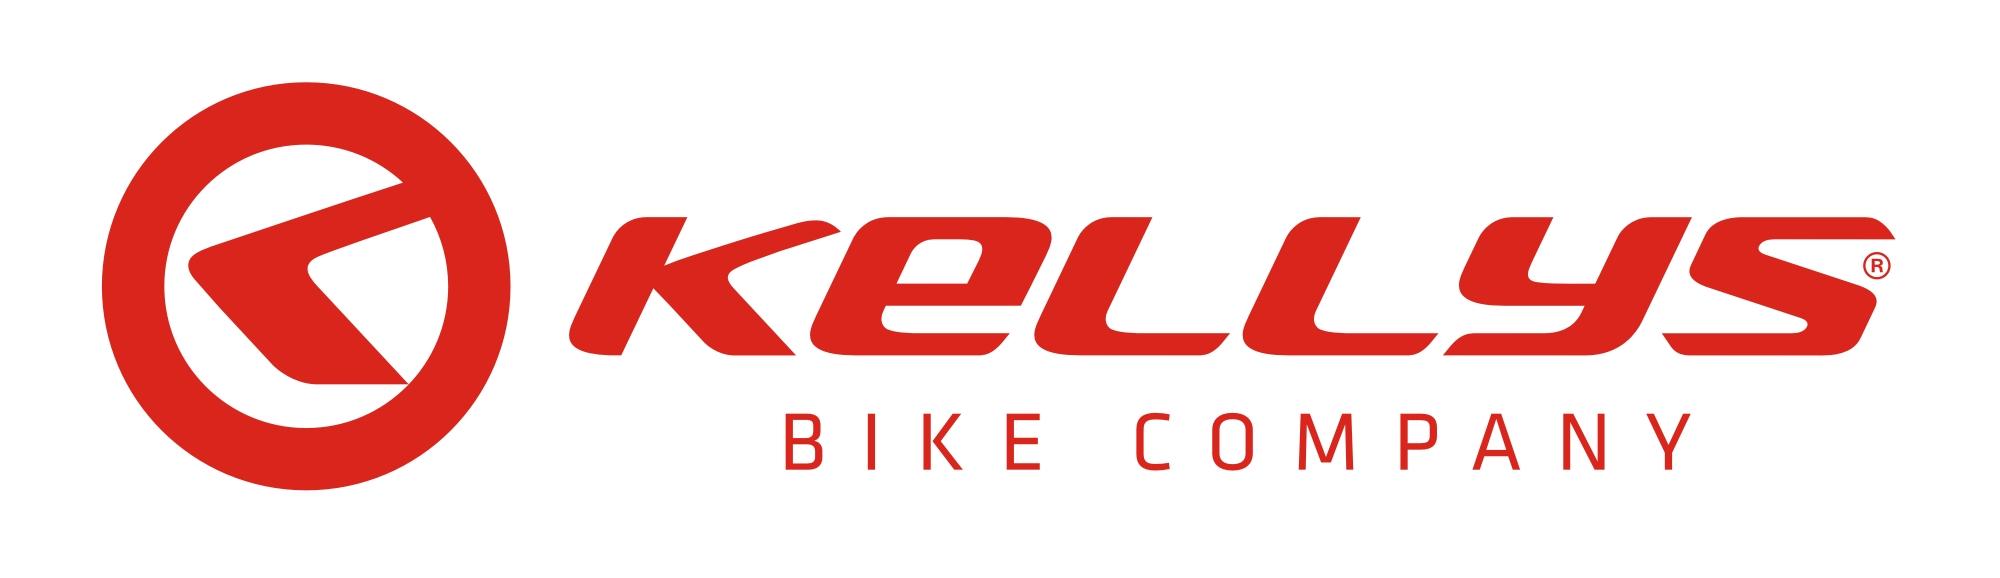 Logo_KELLYS_BICYCLES_2012_red_white.jpg